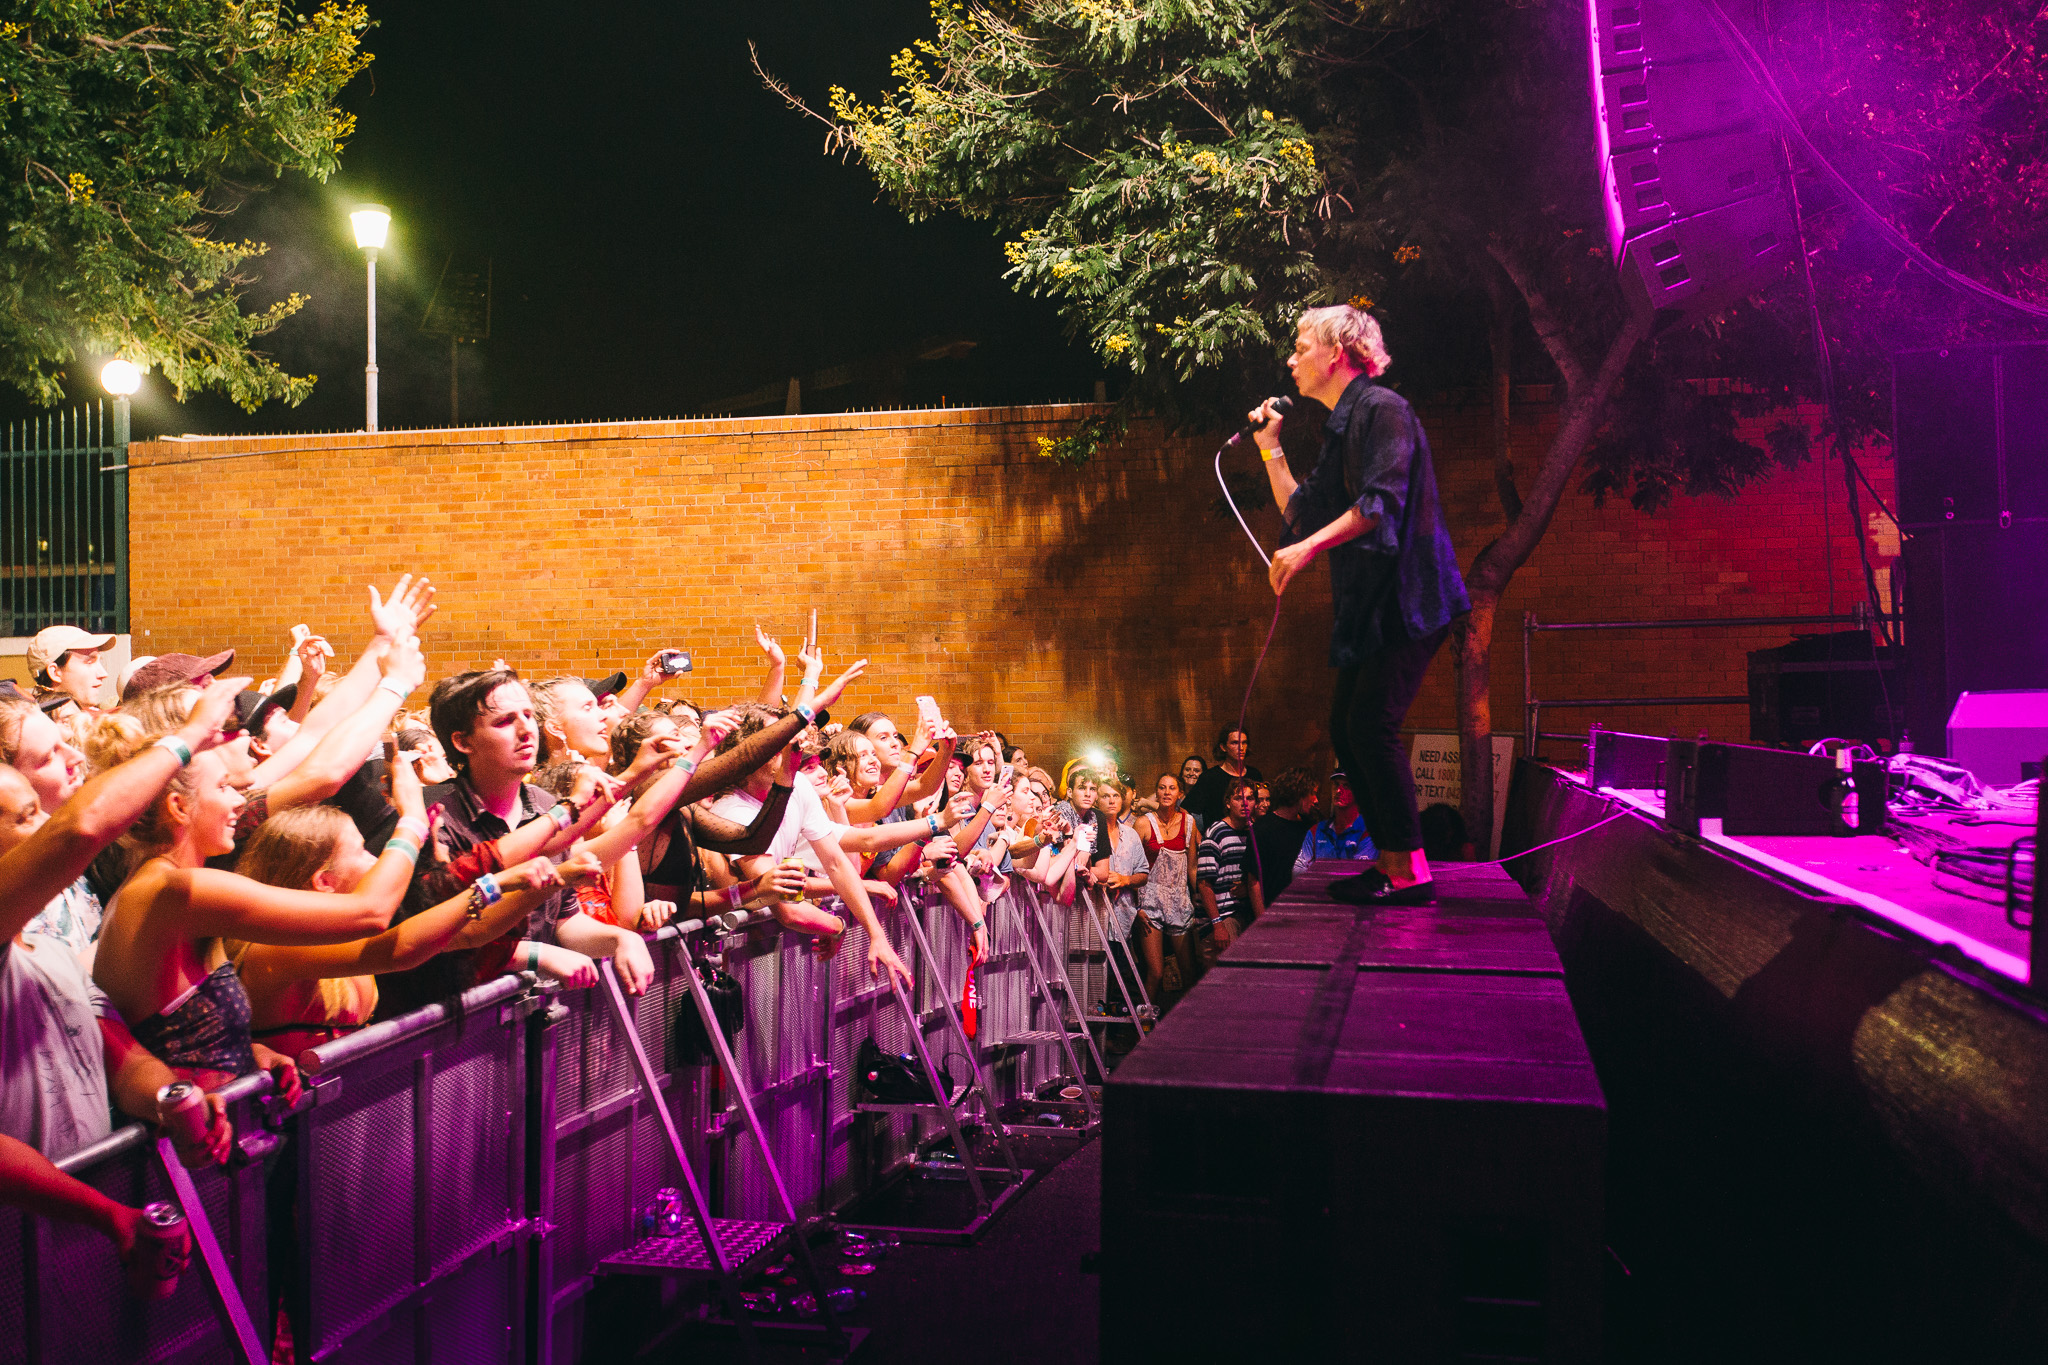 POND_Laneway-Festival-Brisbane-2018_Credit-Bianca-Holderness-7.jpg